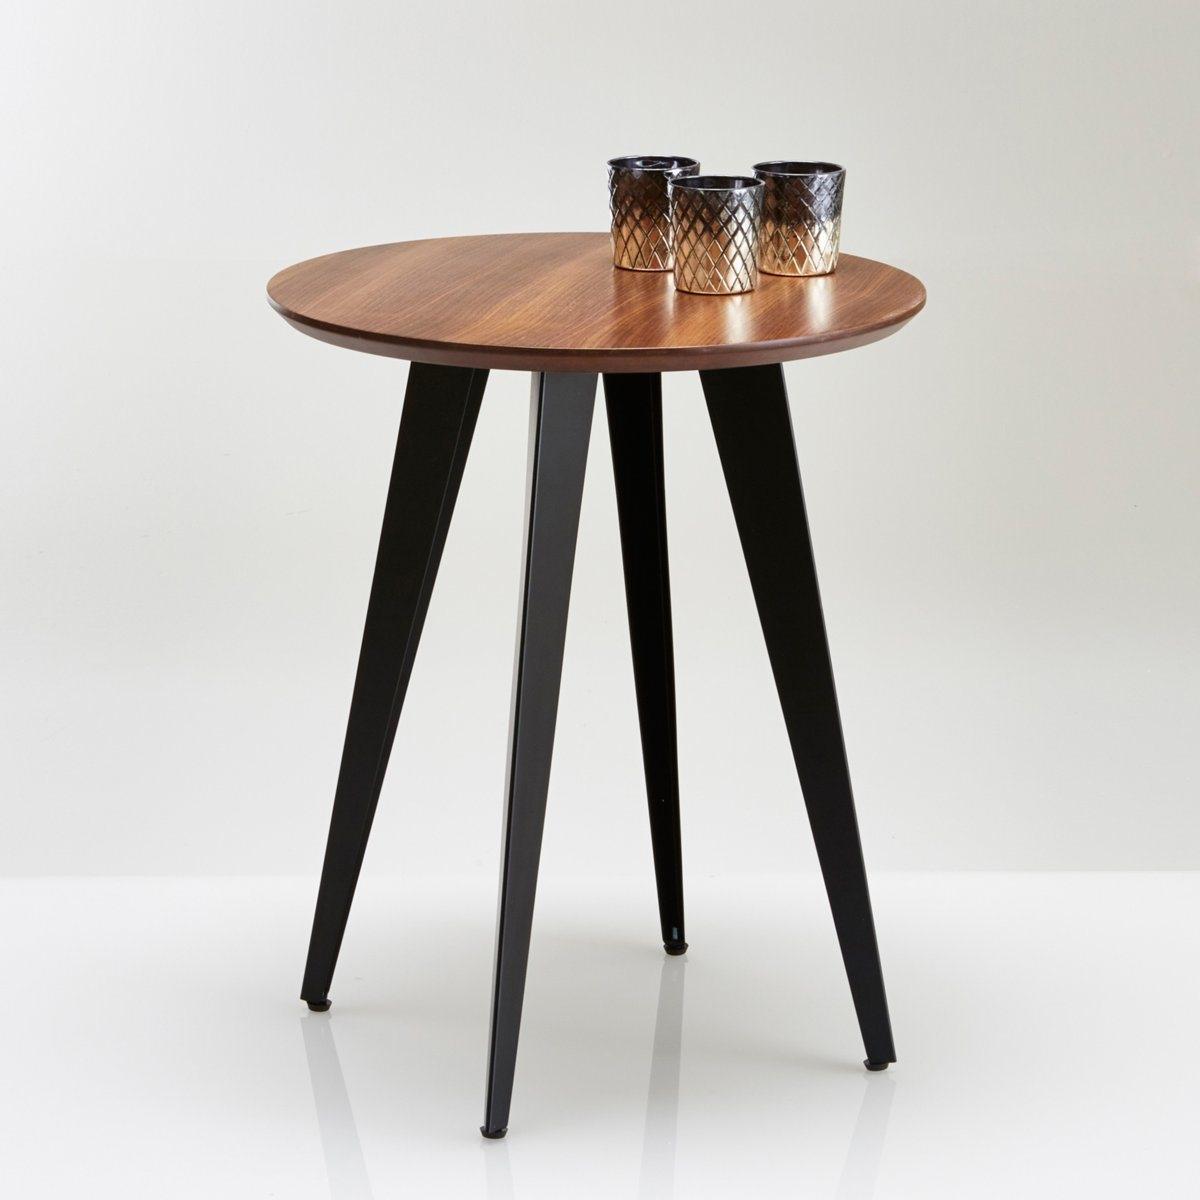 Круглый столик/столик для канапе в стиле винтаж   Watford от La Redoute